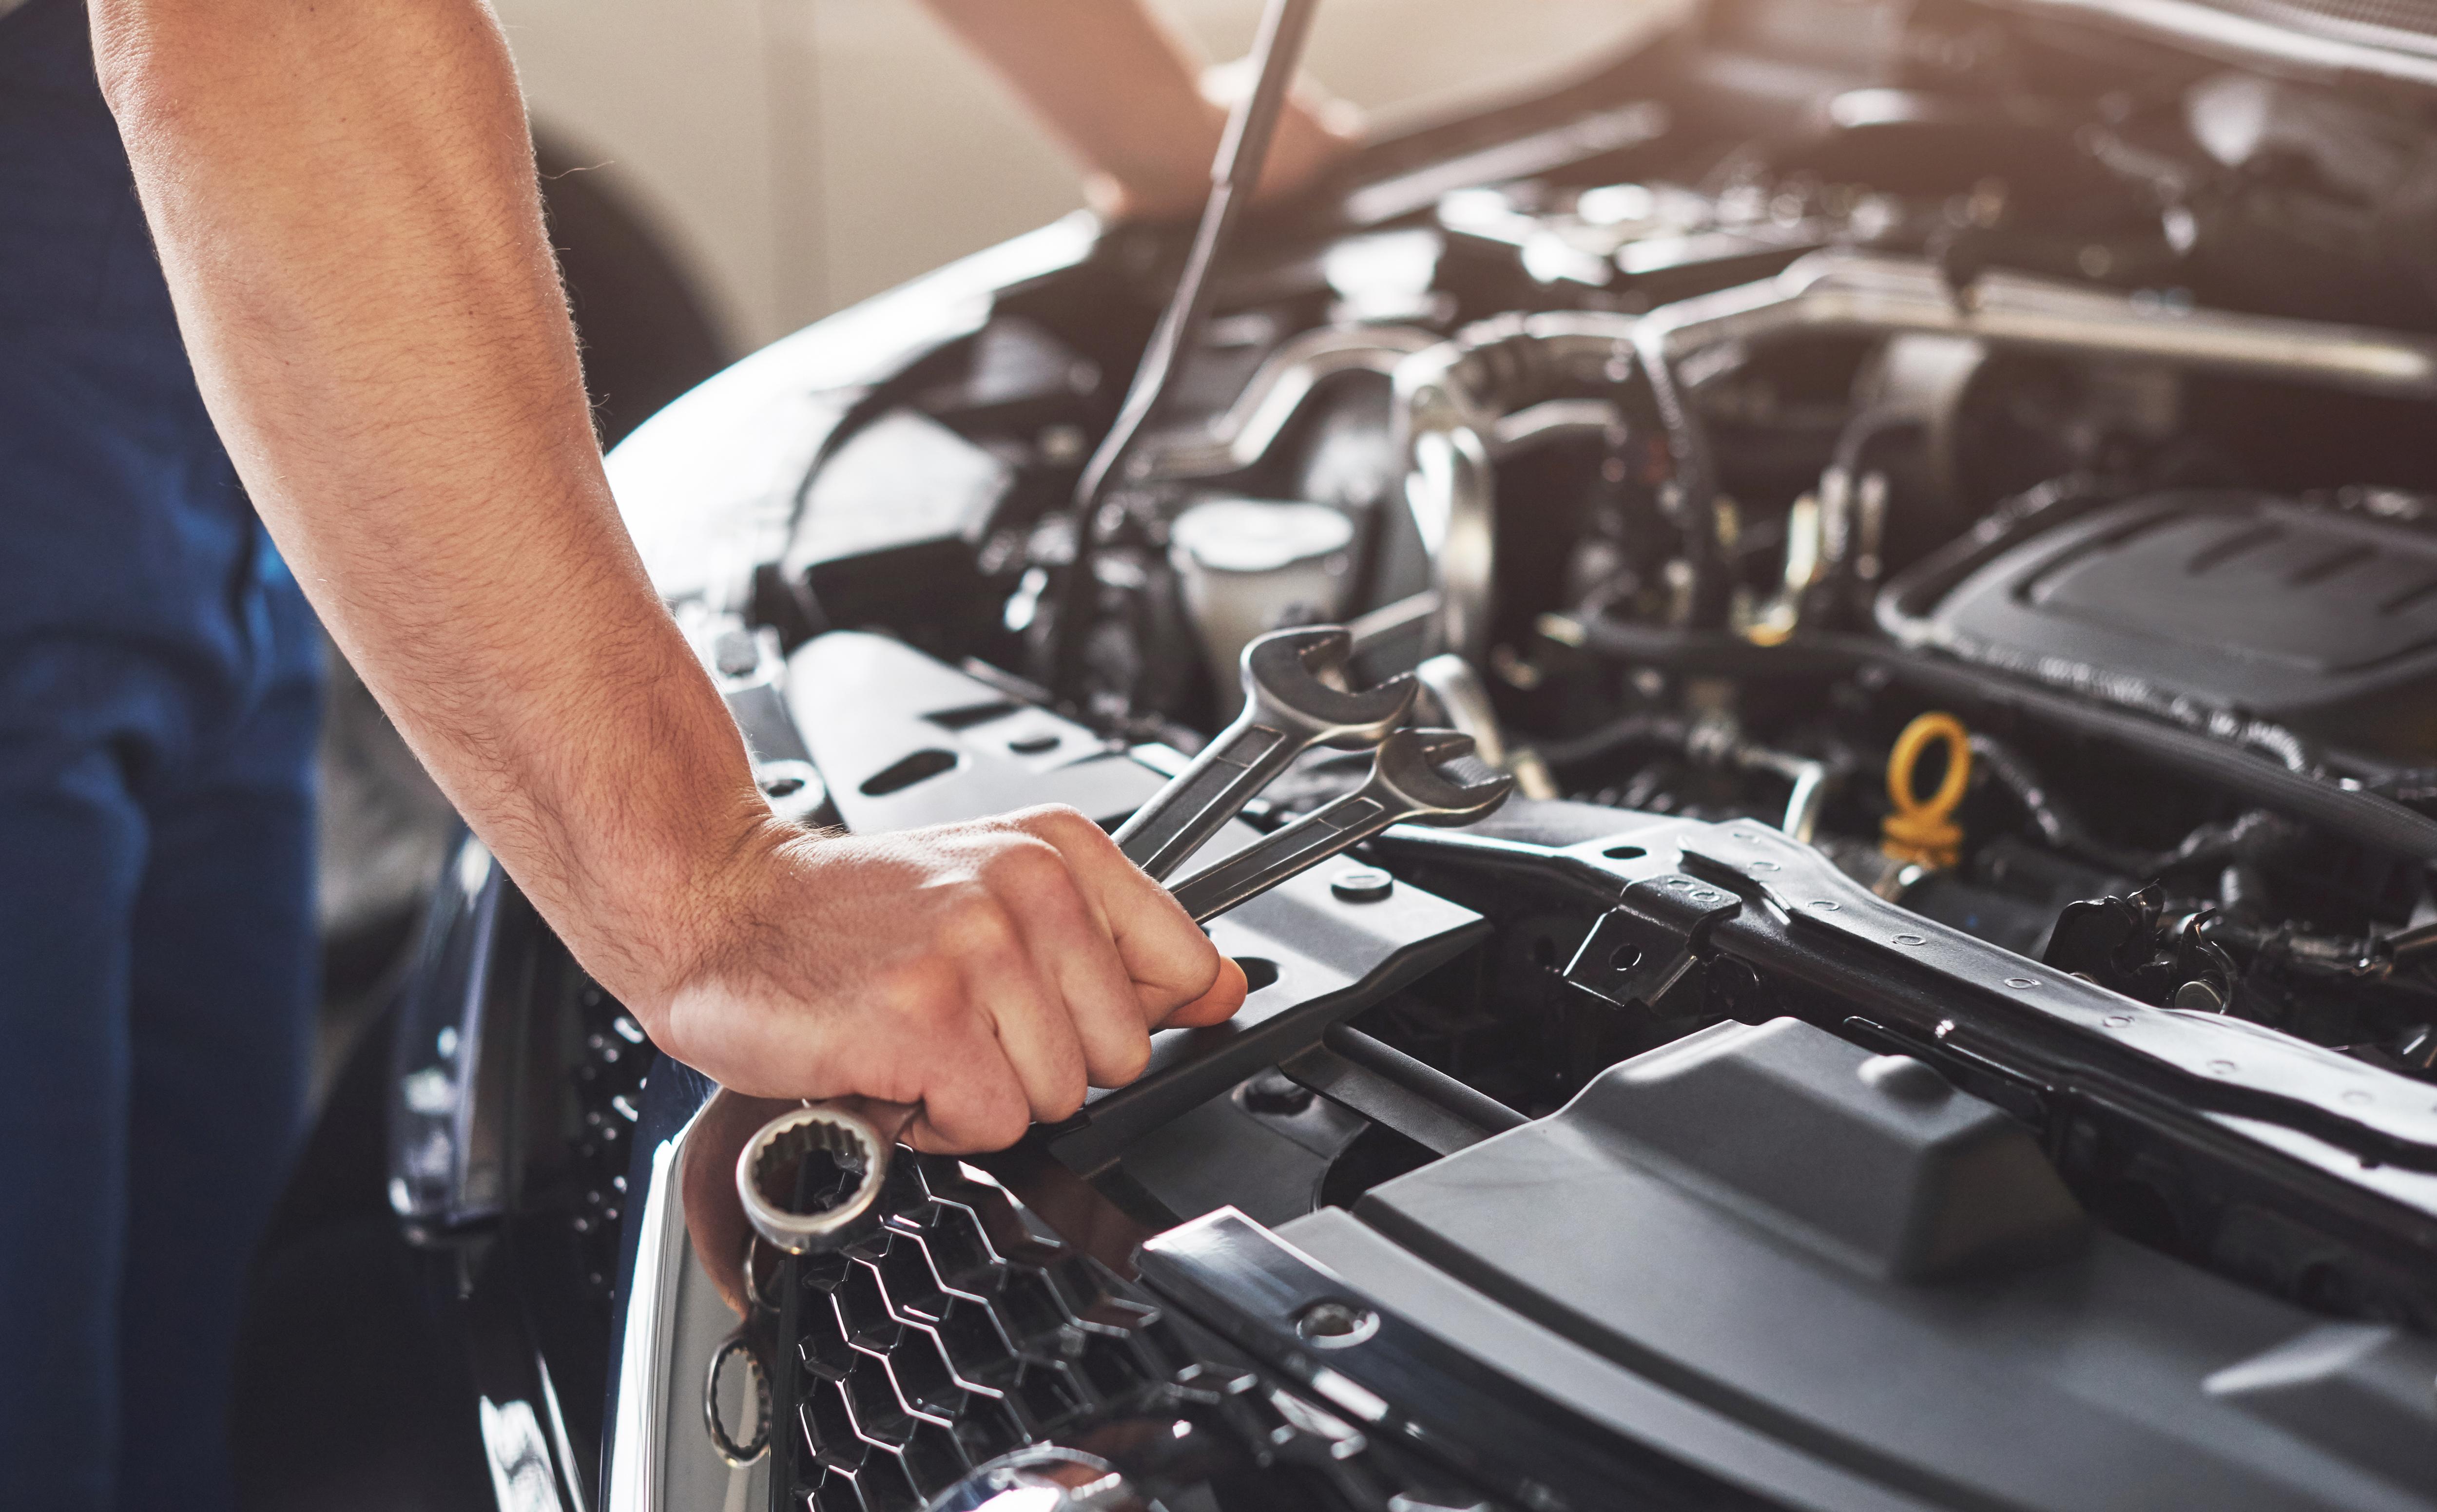 muscular-car-service-worker-repairing-vehicle